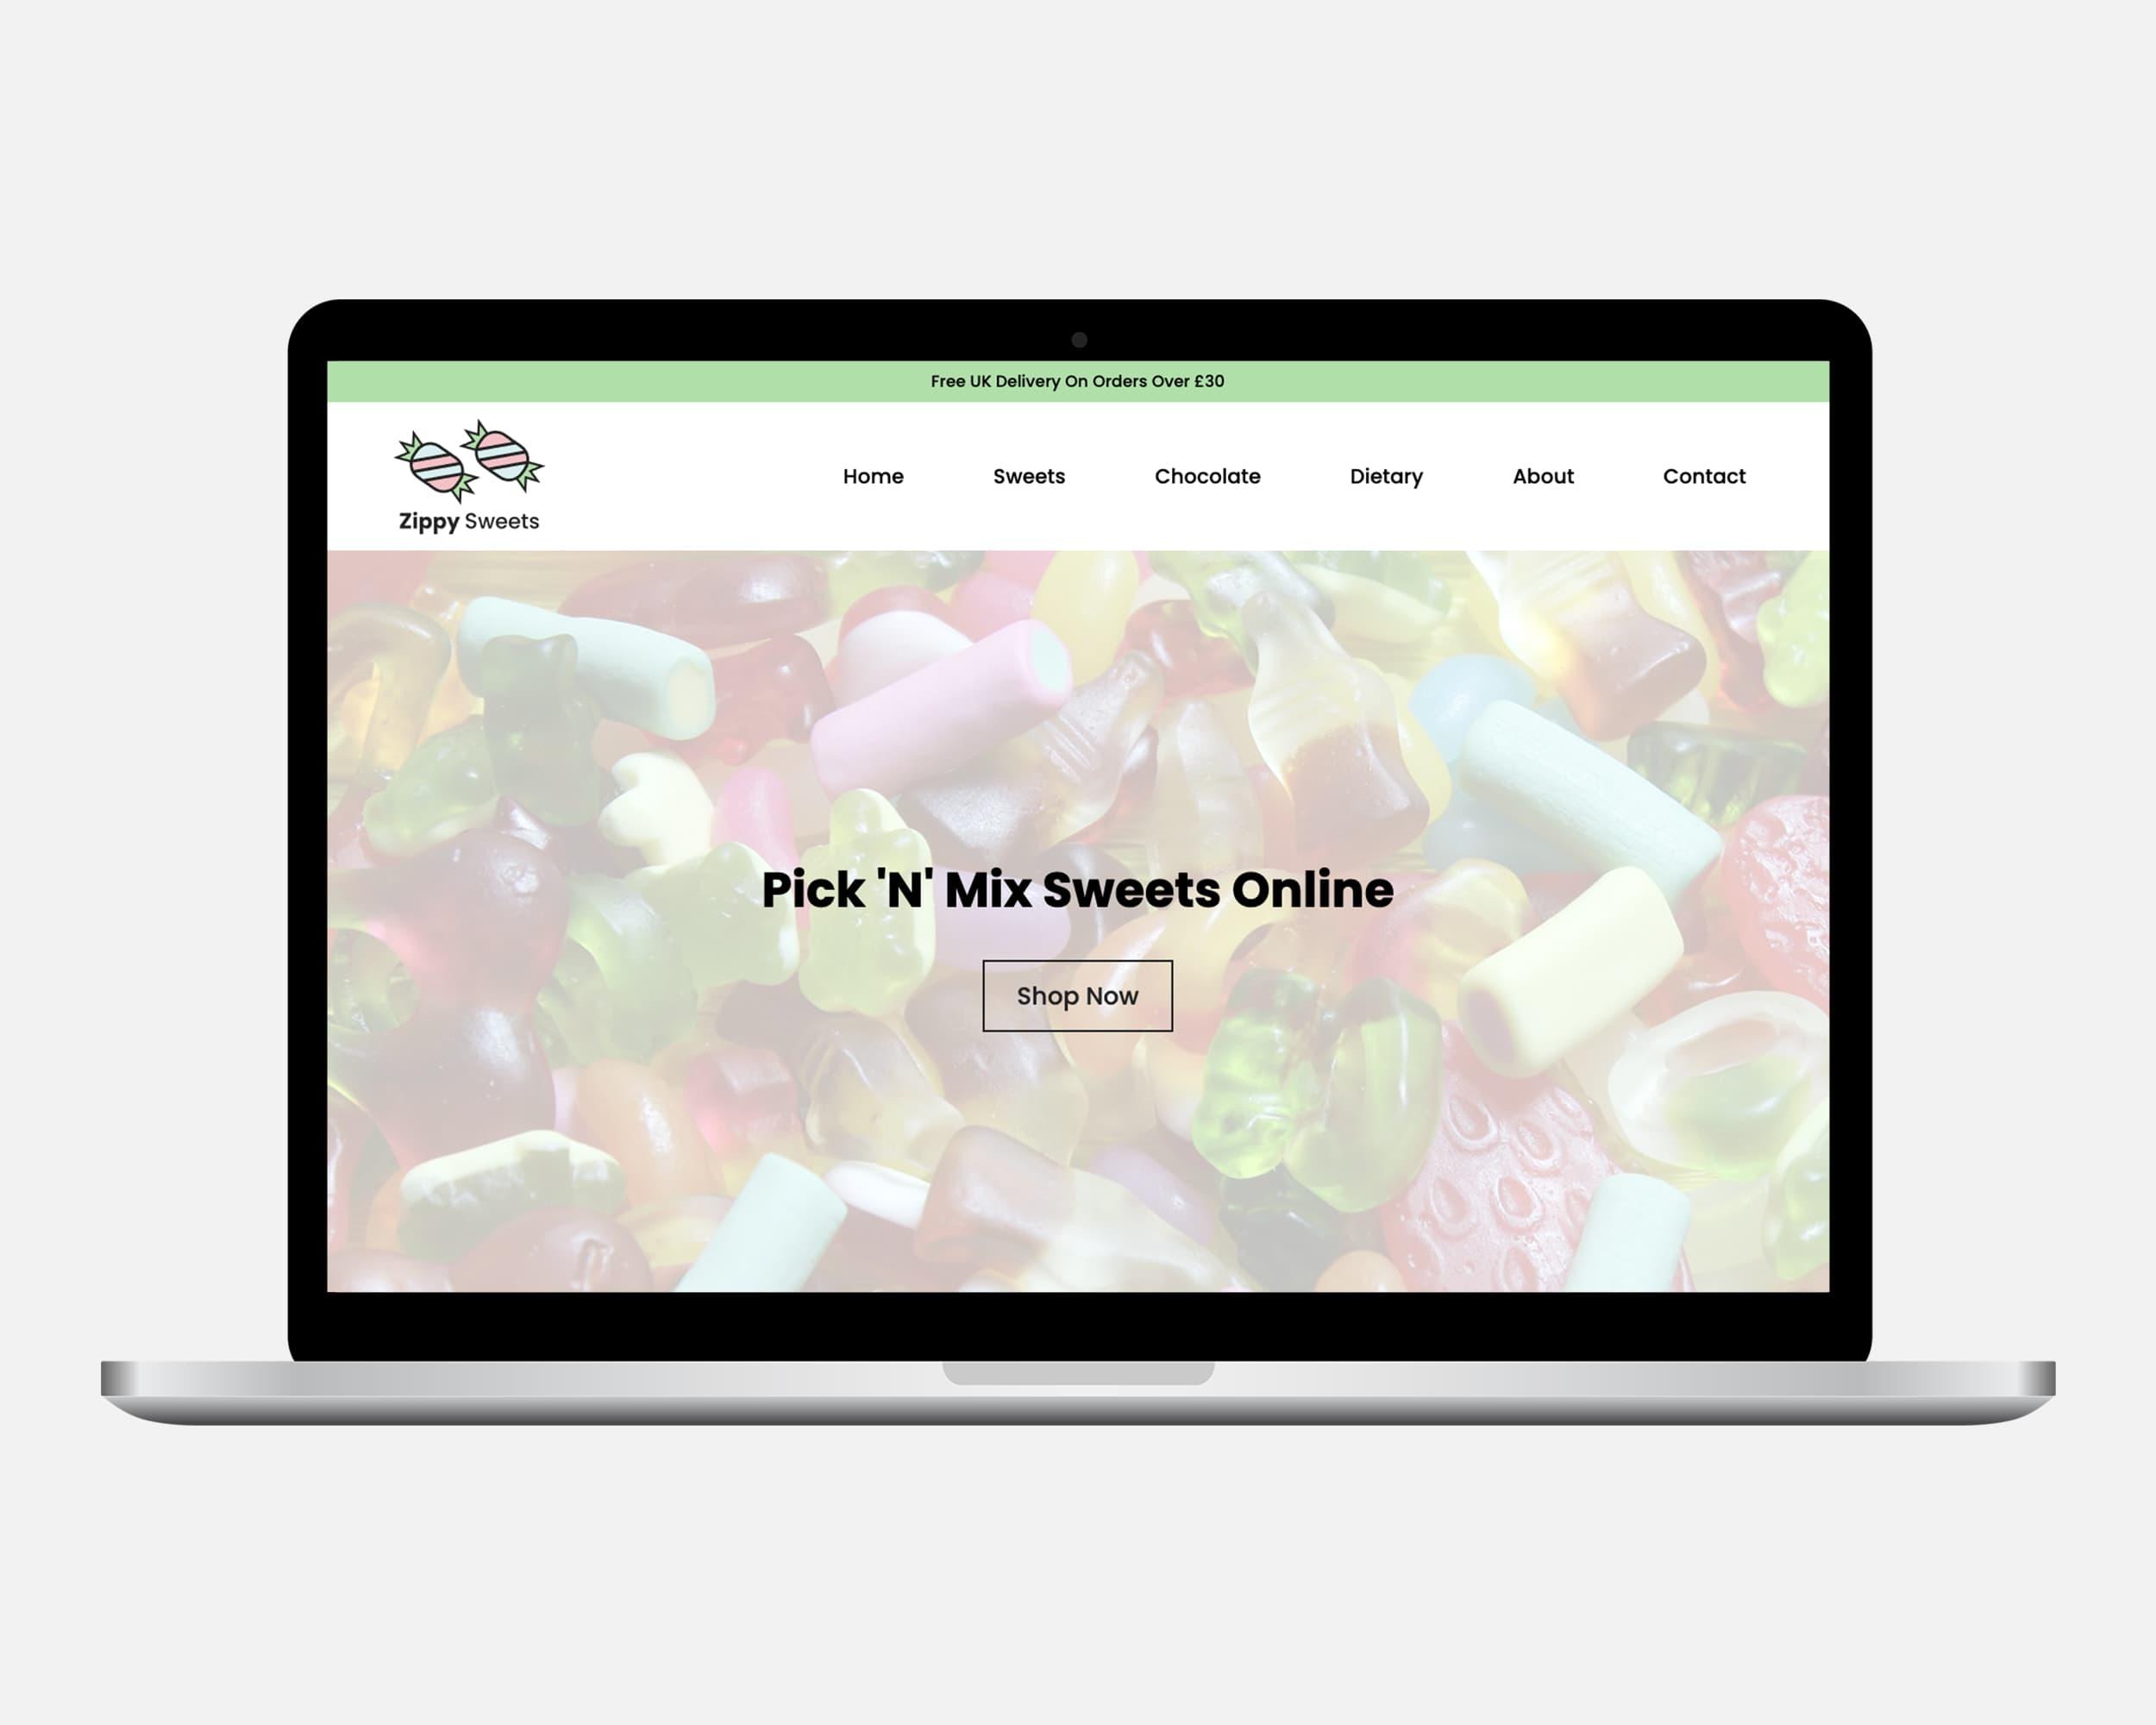 Zippy Sweets eCommerce Website